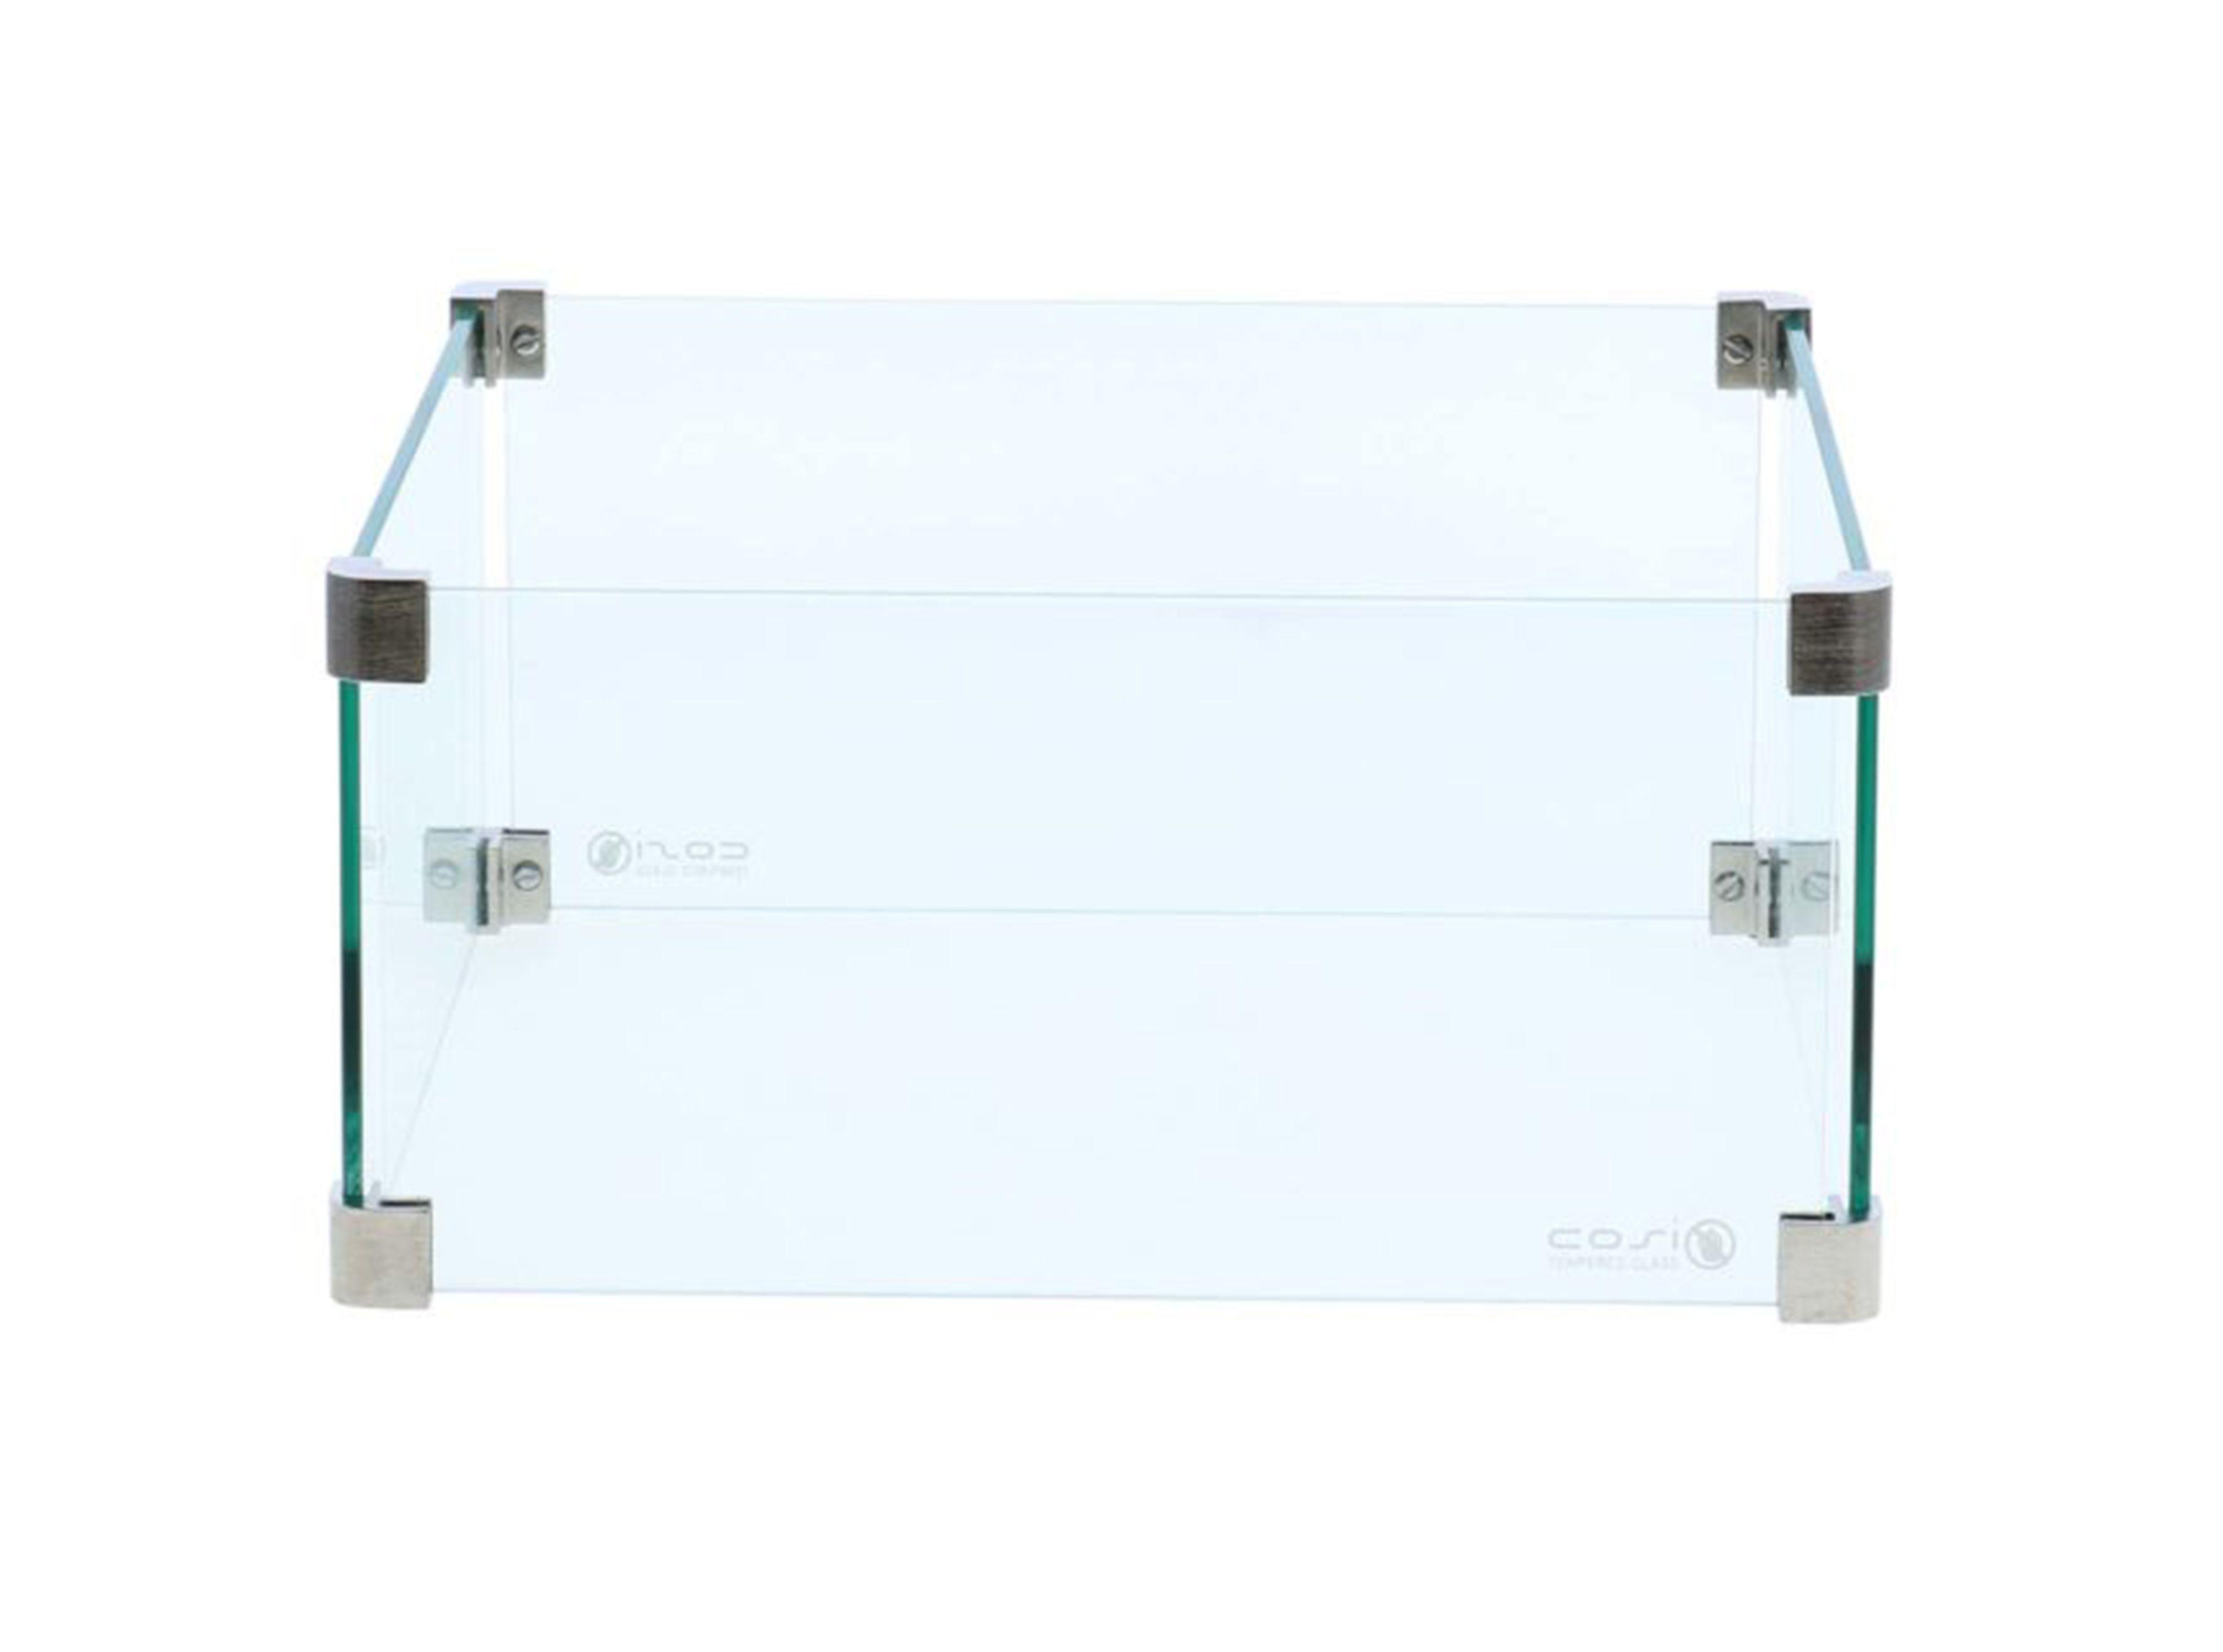 Cosi | Square M Glass Set